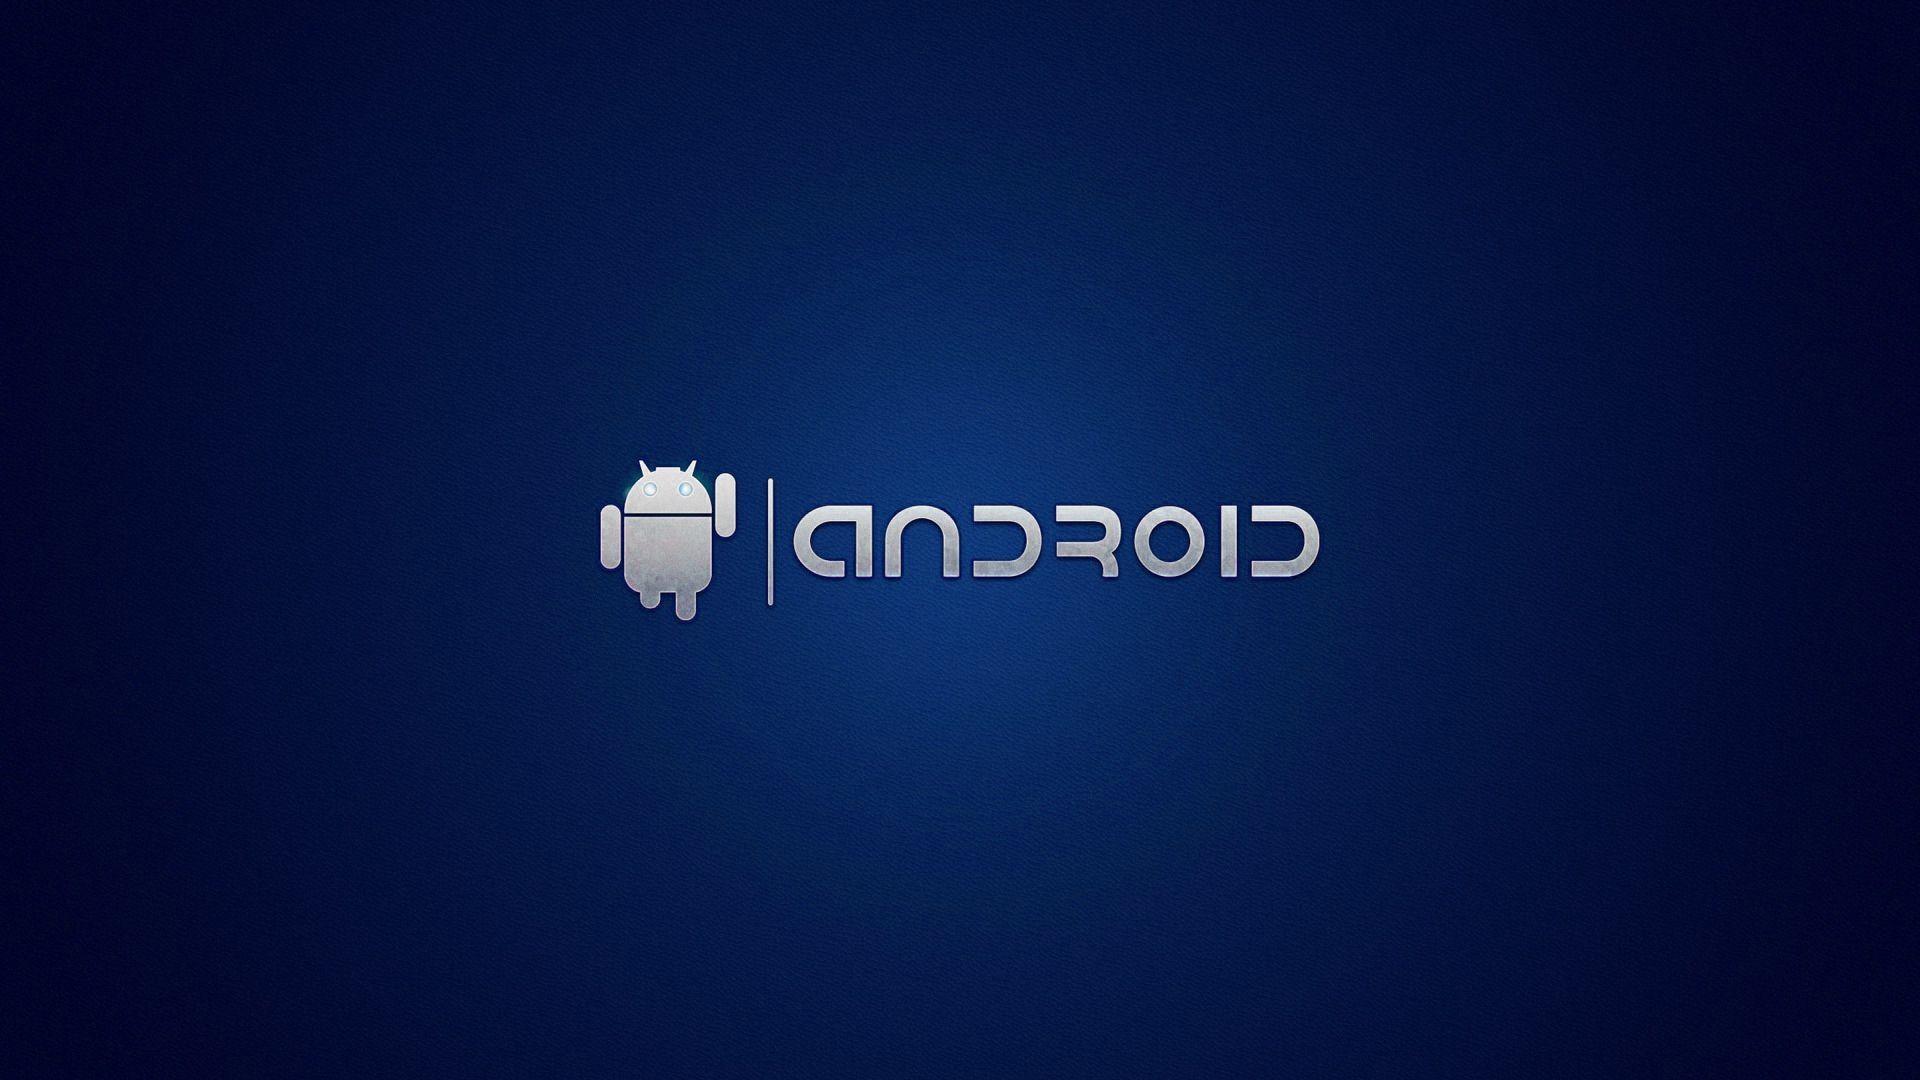 2000 Wallpaper Android Hd Logo  Gratis